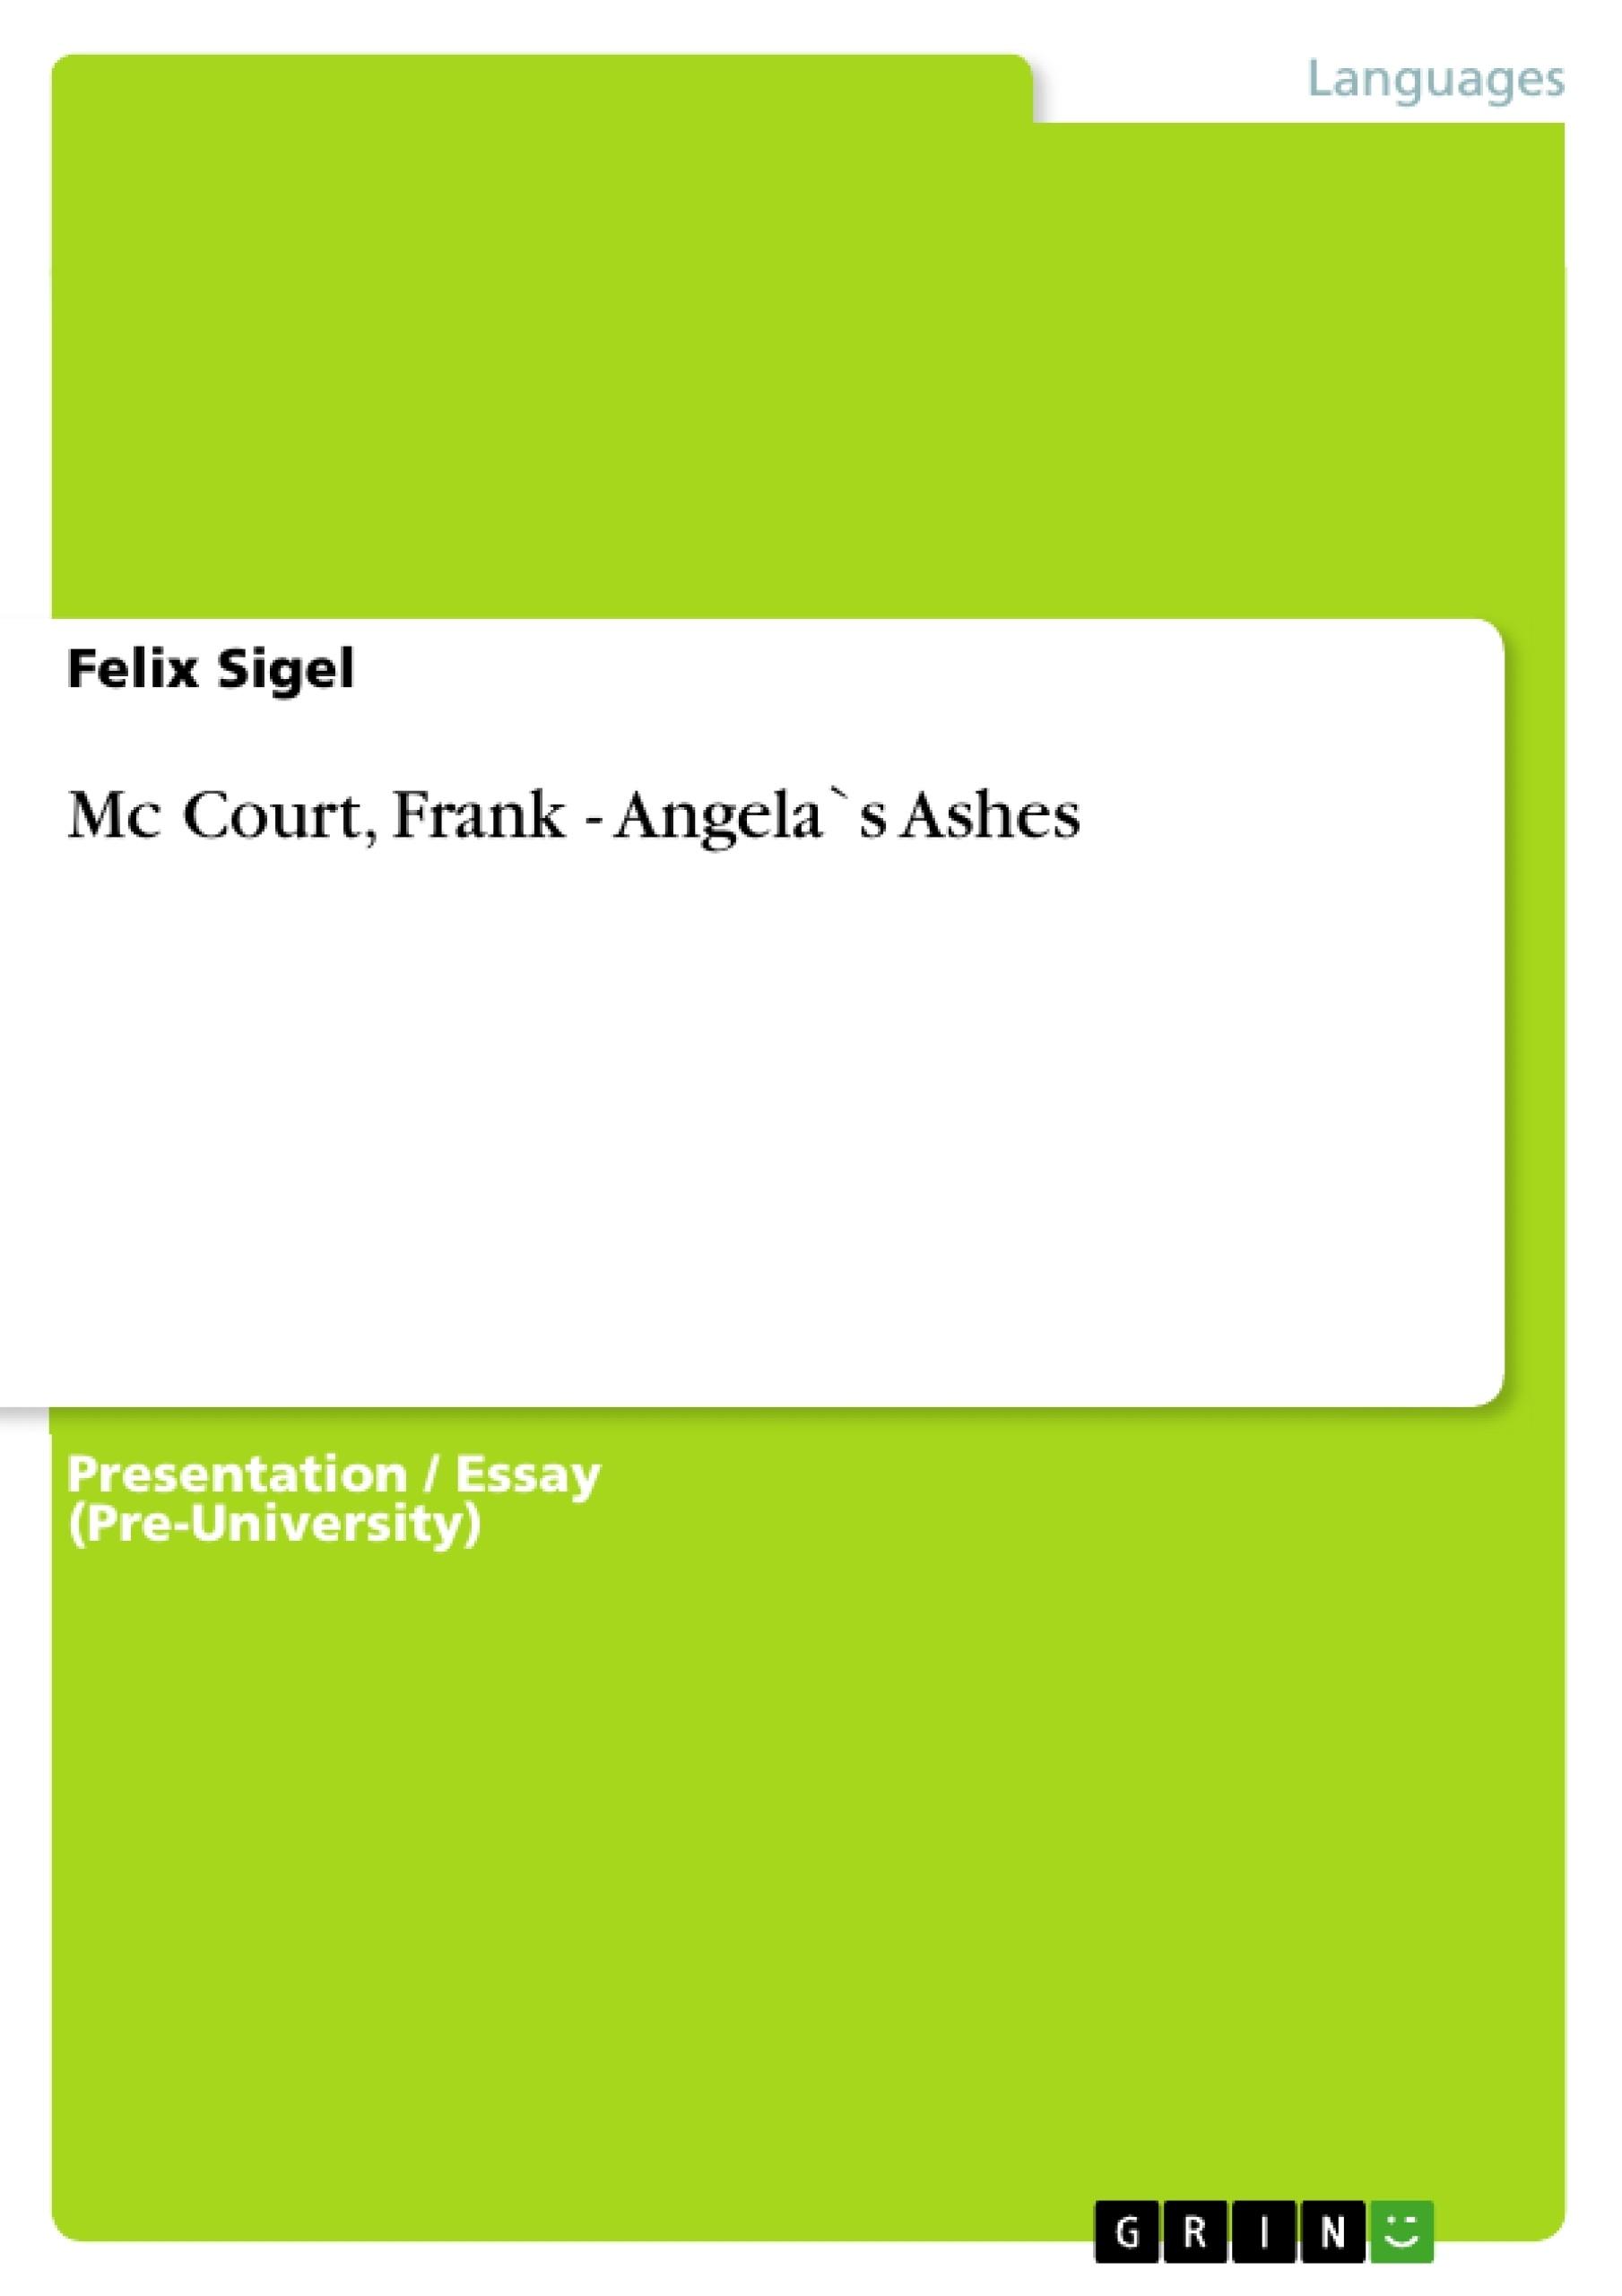 Title: Mc Court, Frank - Angela`s Ashes